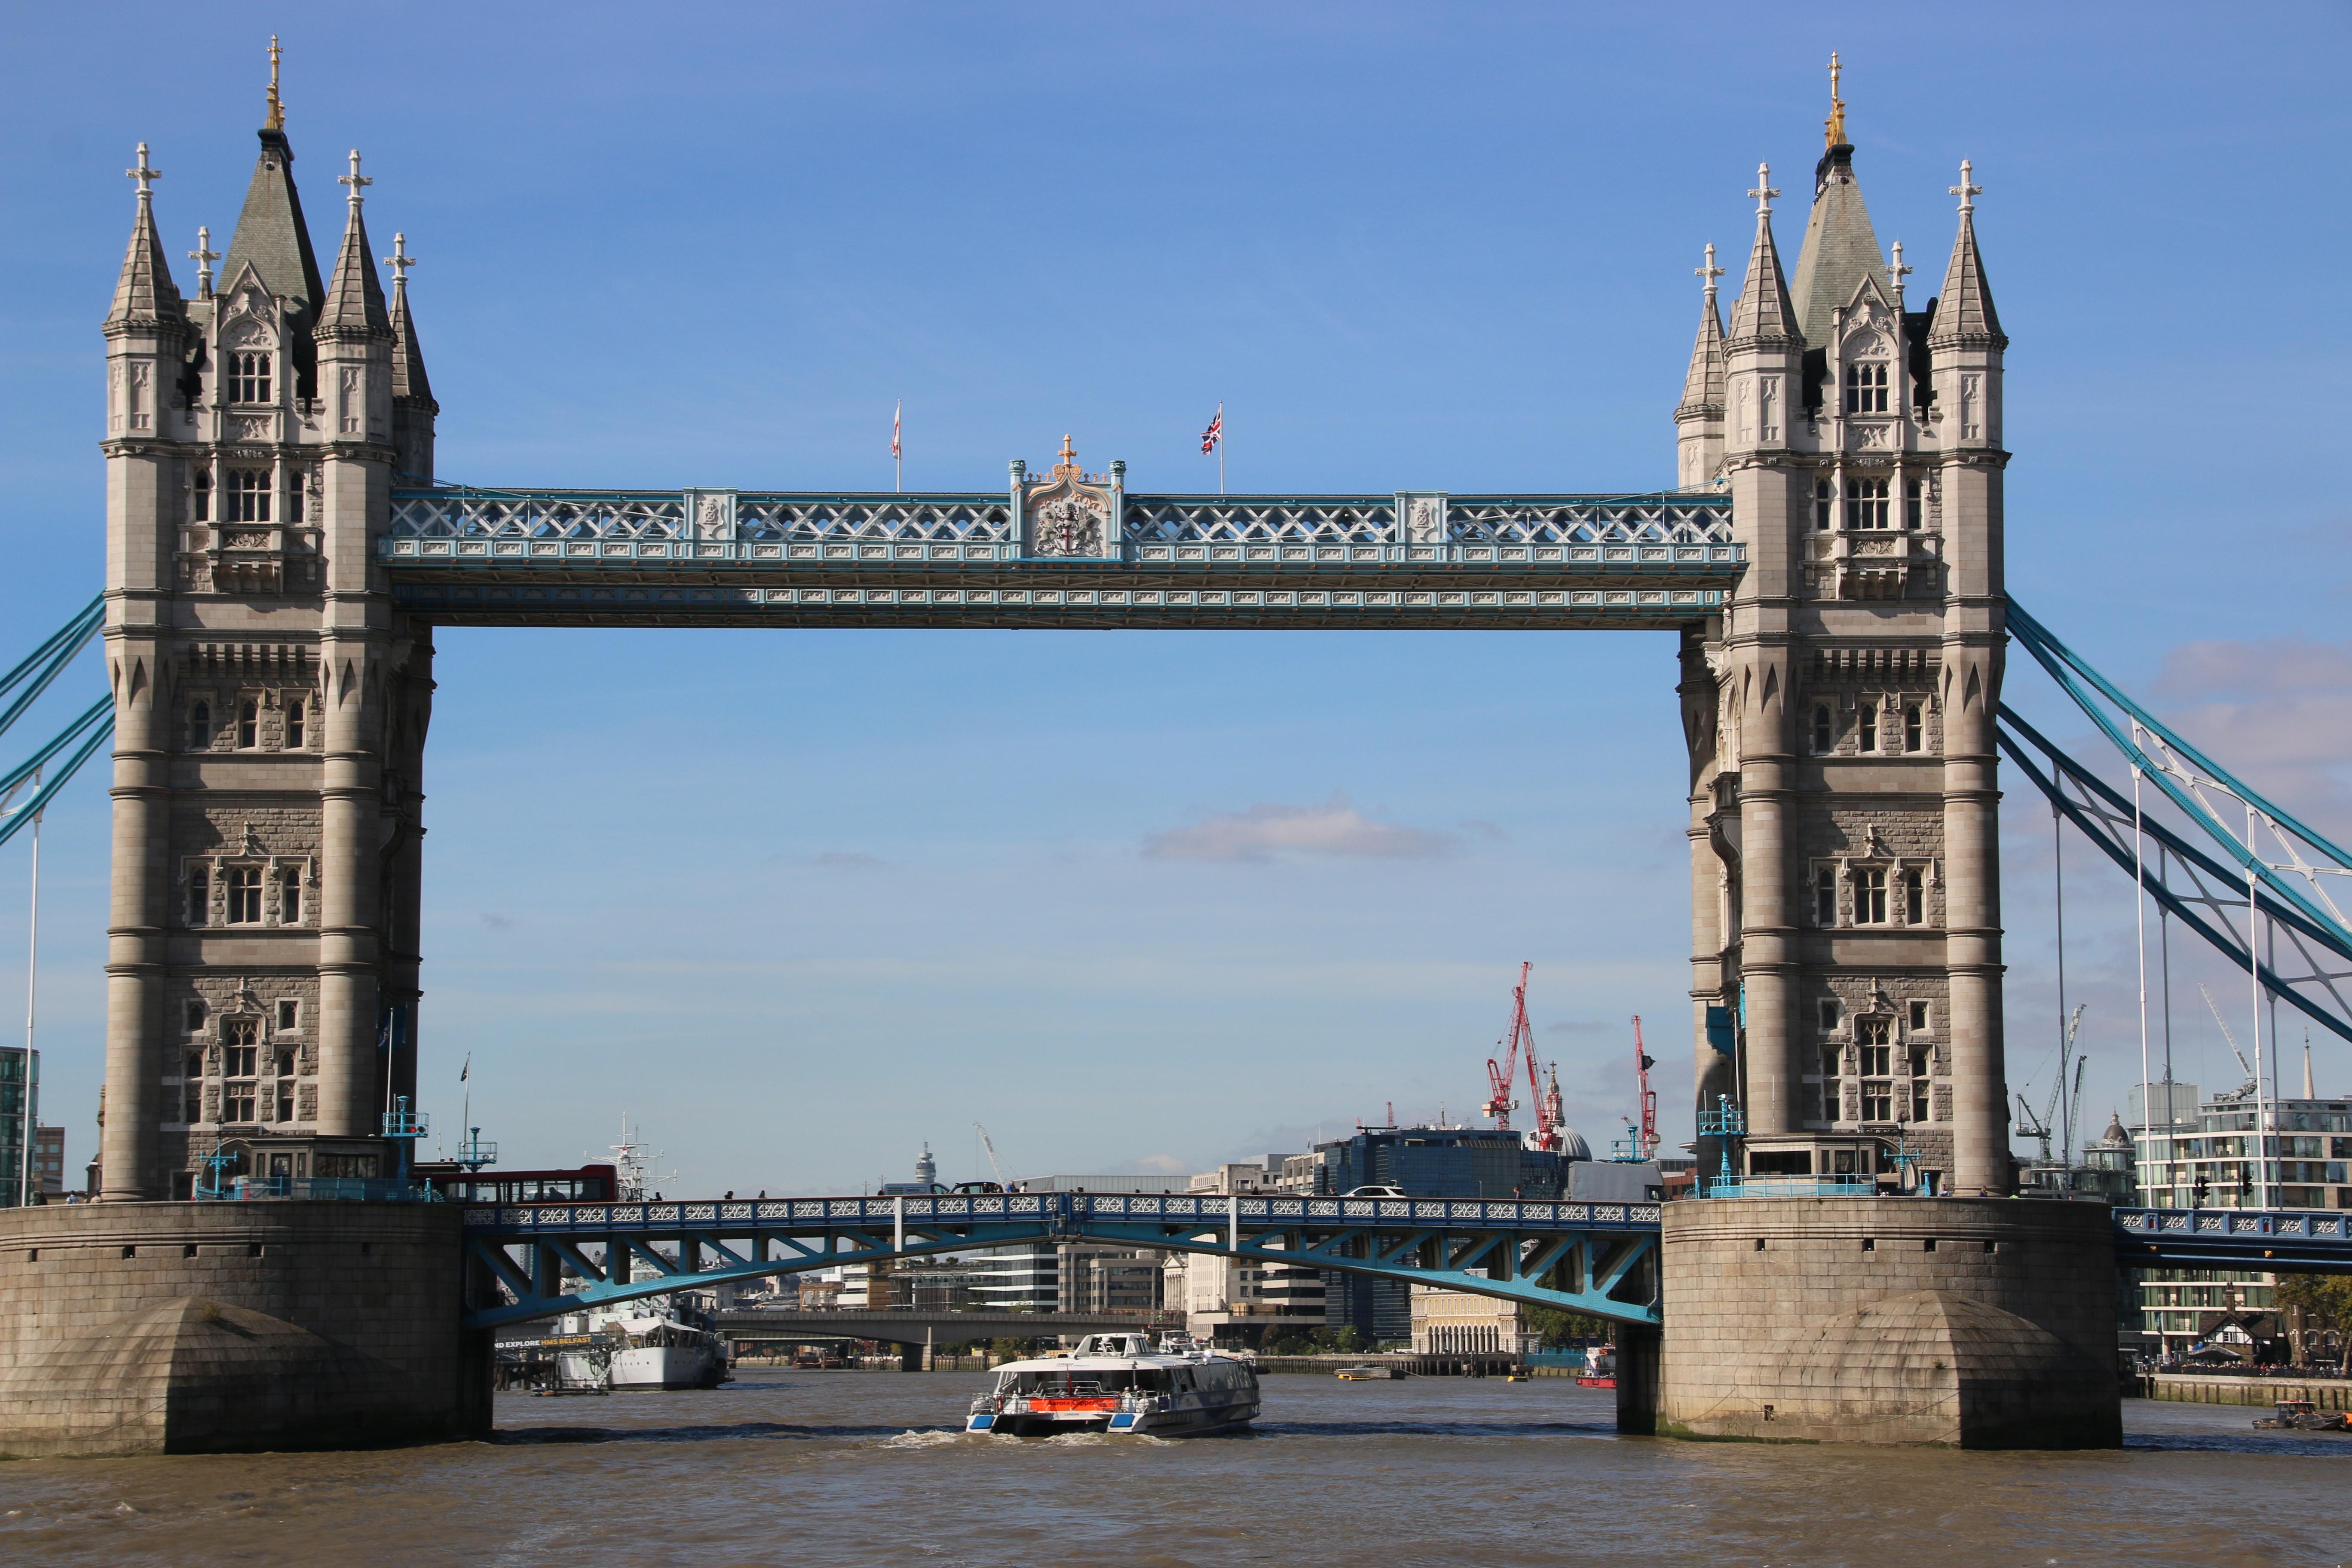 113-tower-bridge-9555